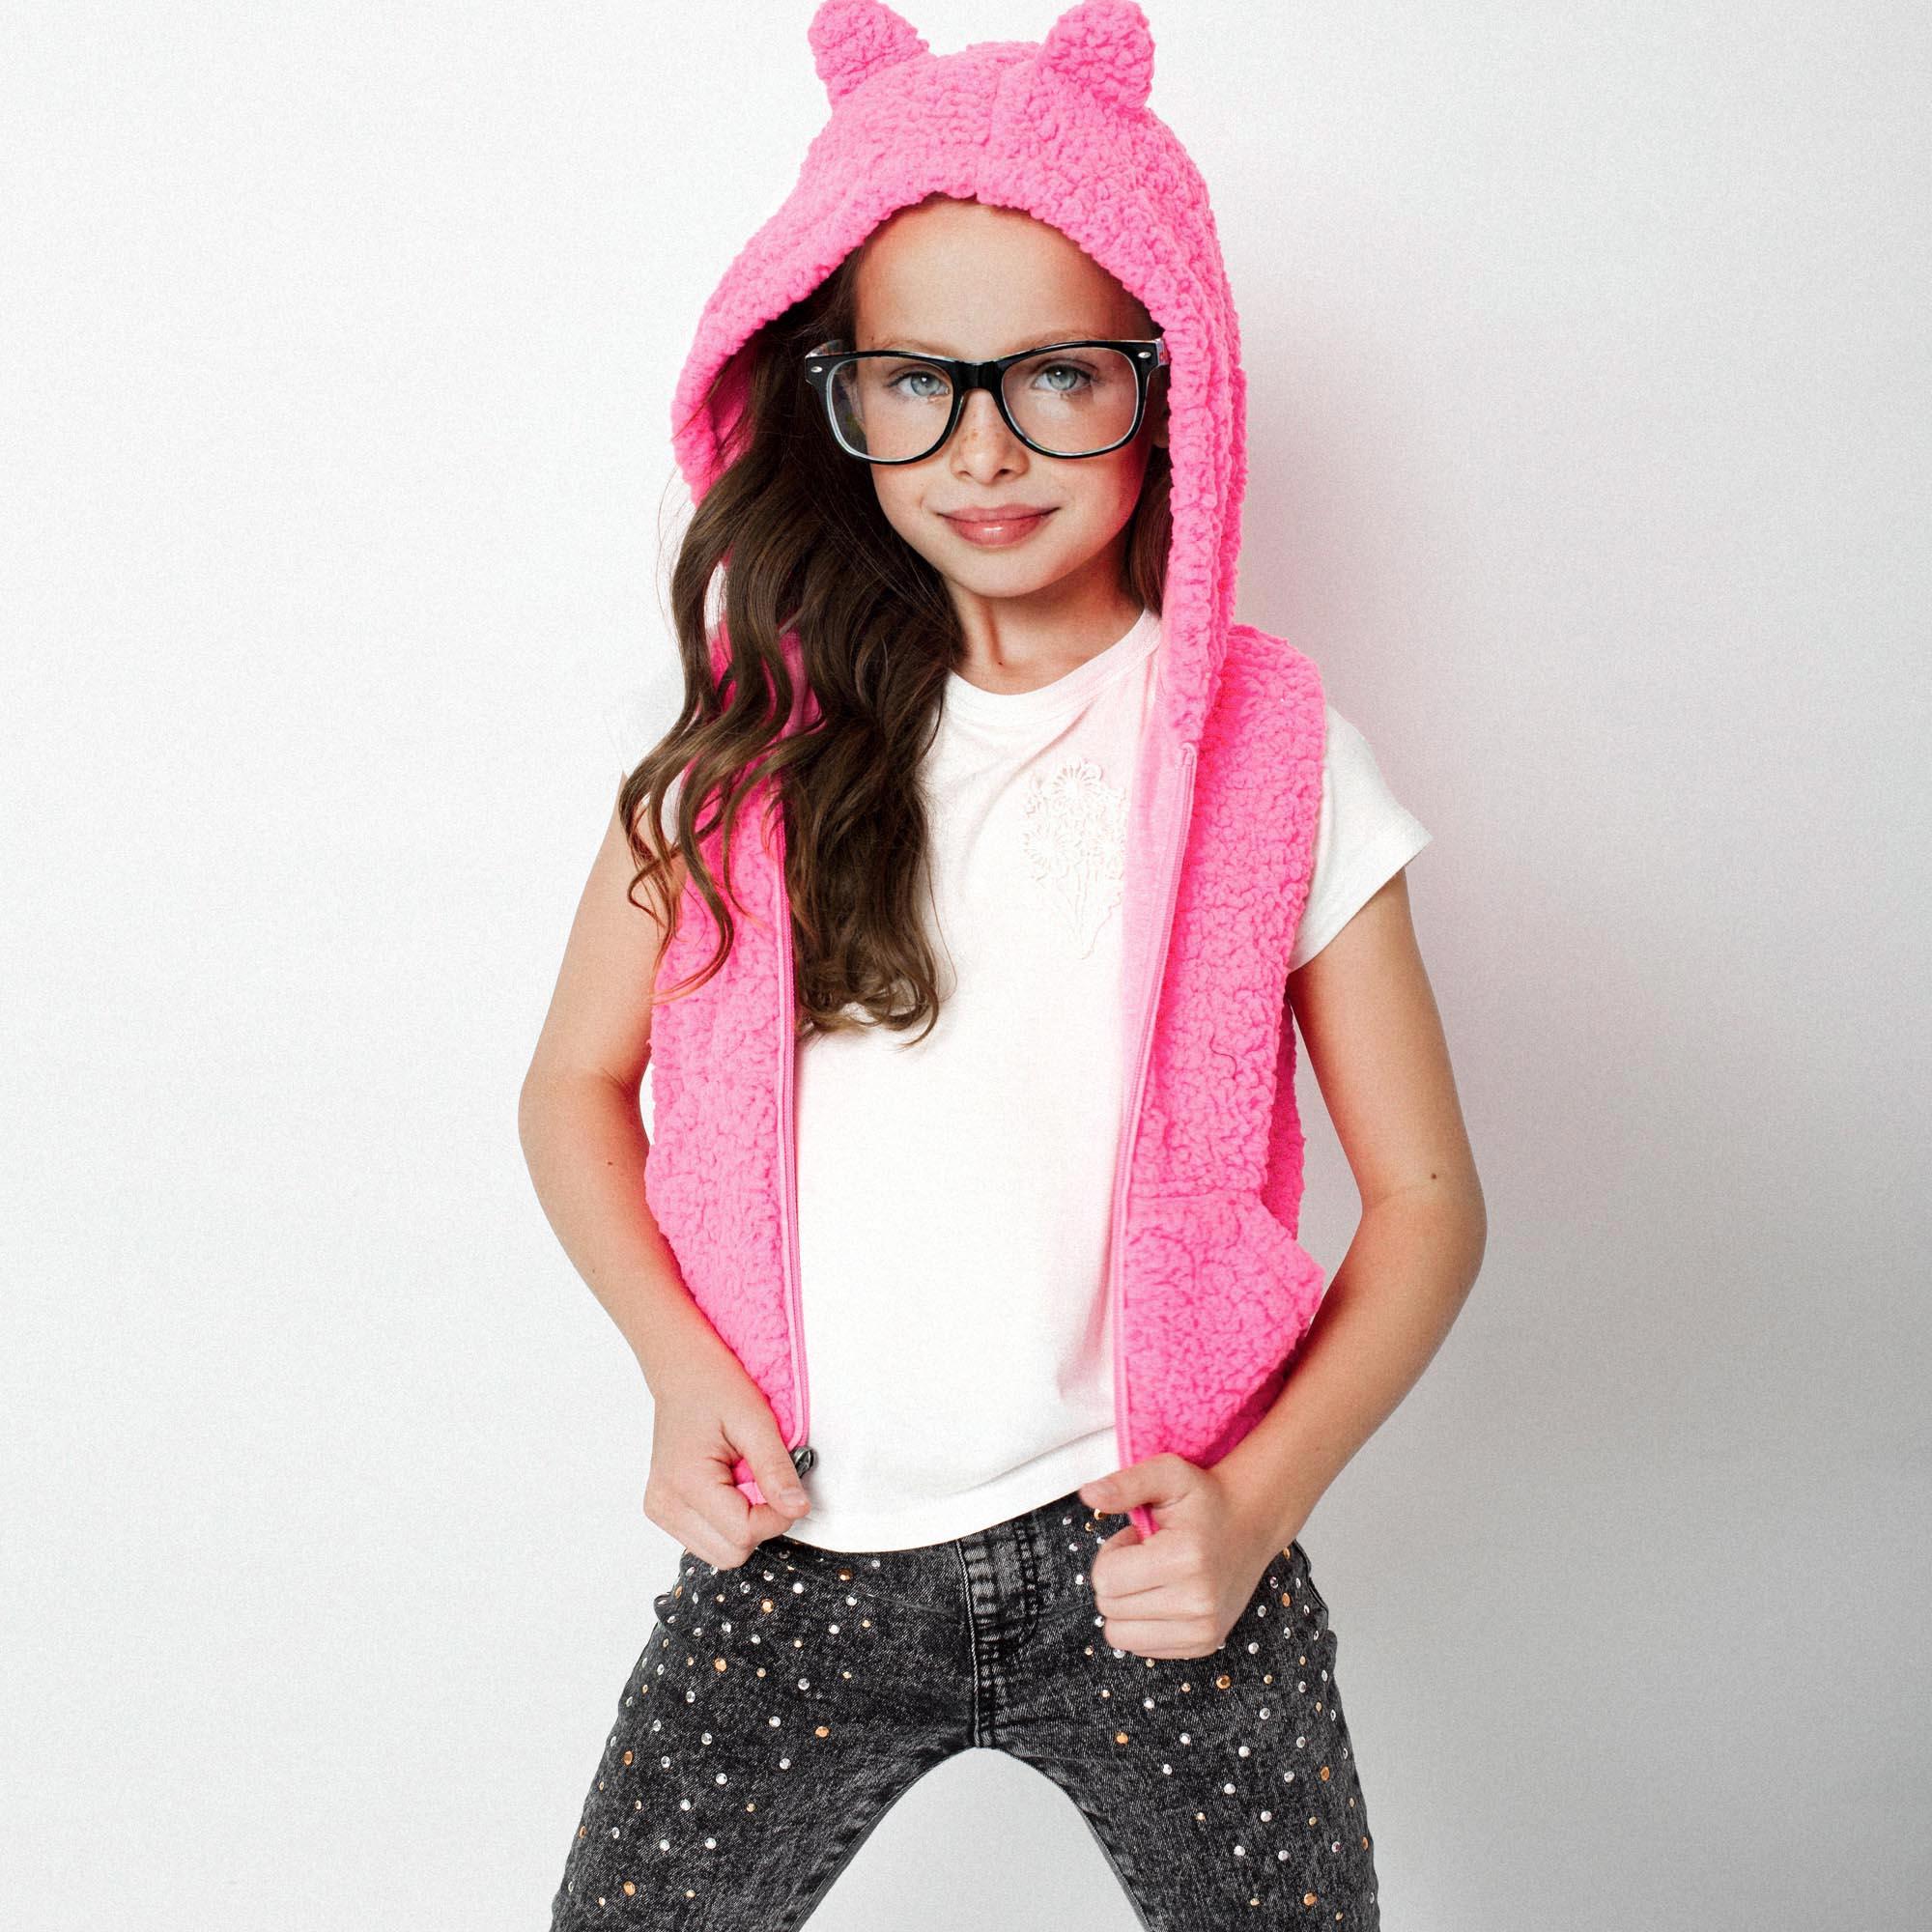 nyc-photographers-kids-modeling-100052.jpg